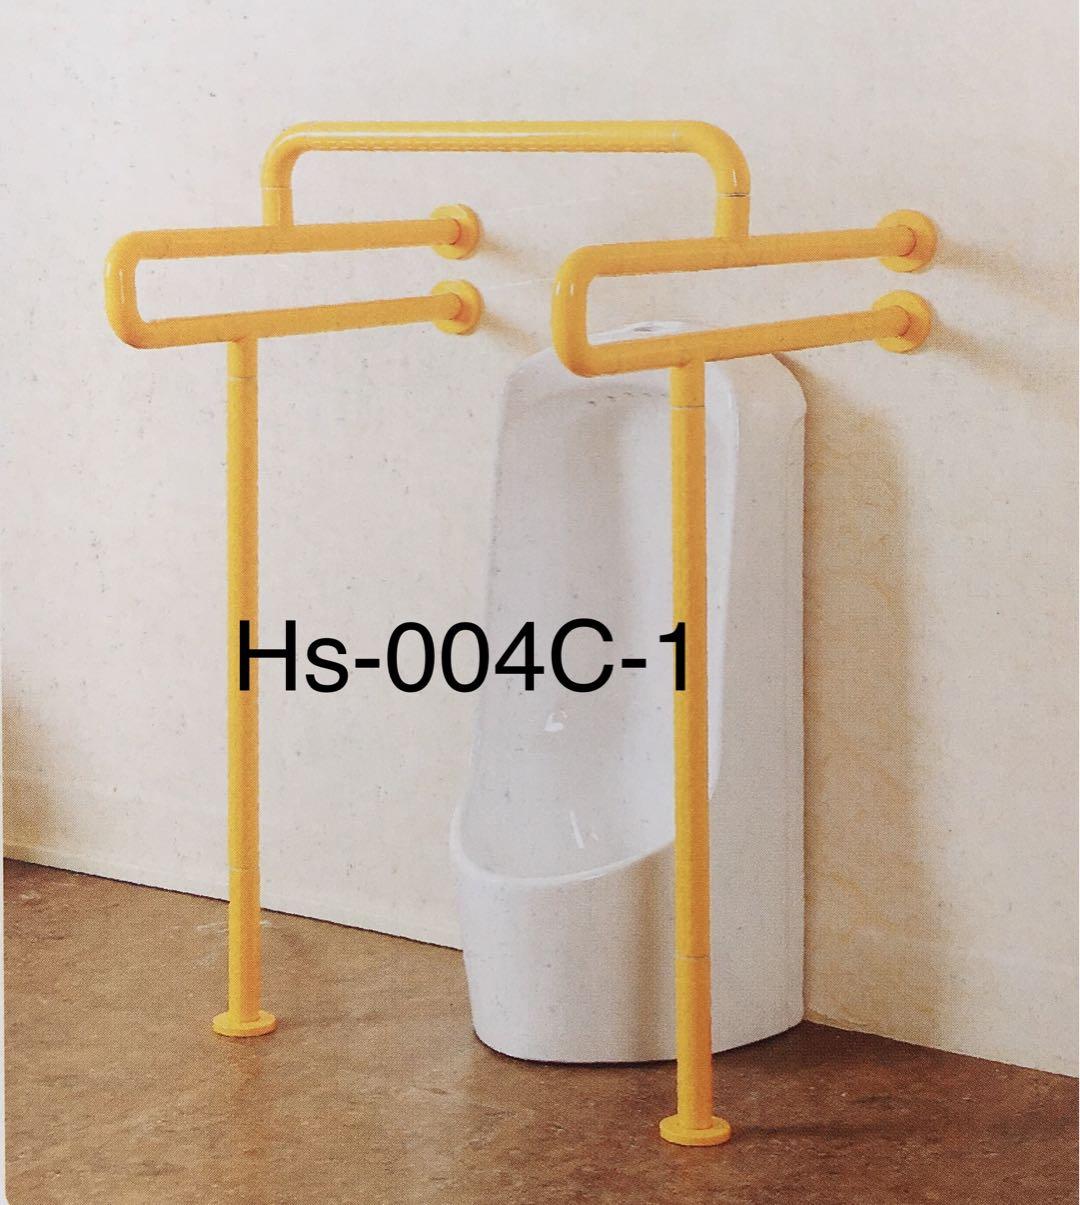 Hs-004C-1无障碍便池扶手